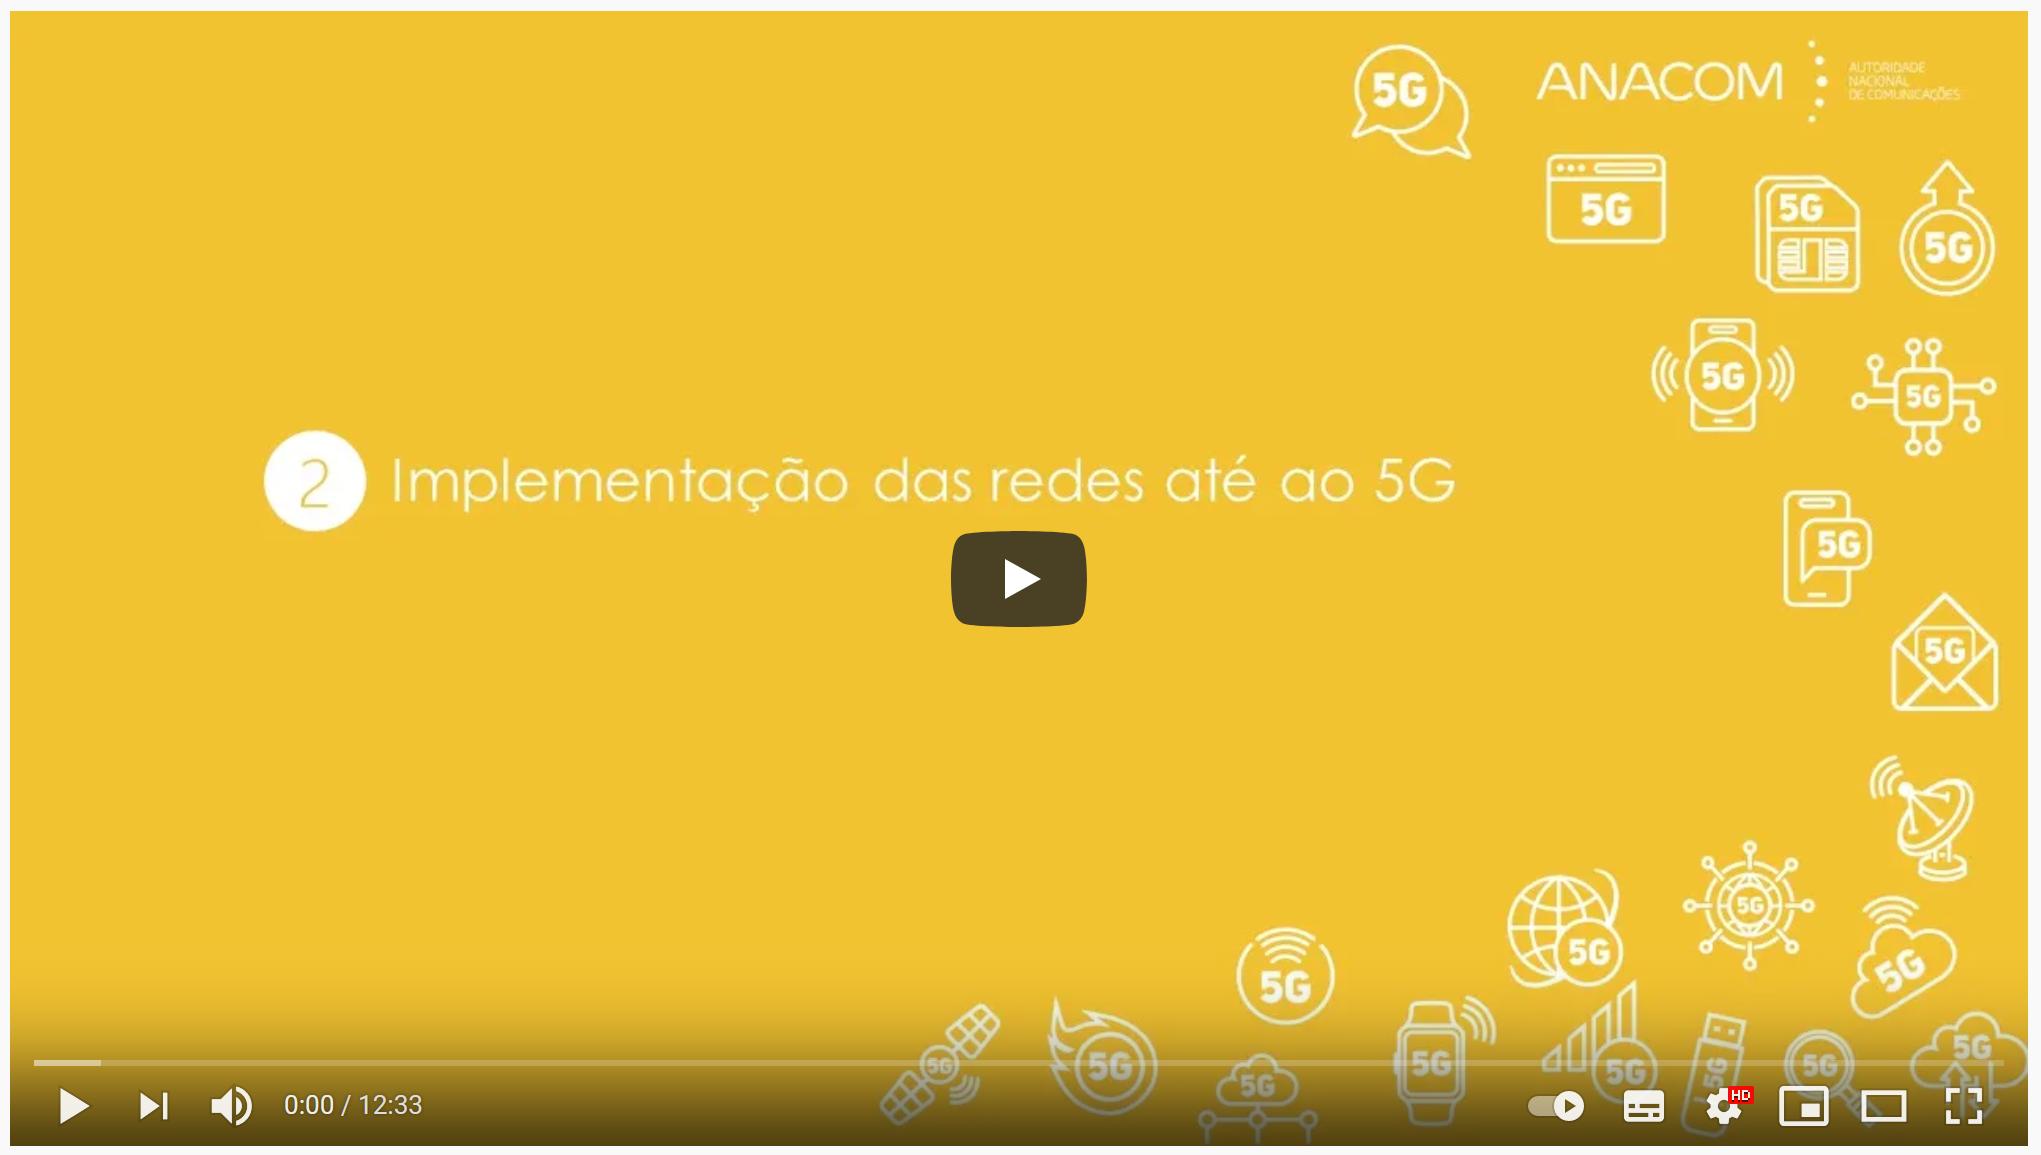 2.-video-implementacao-das-redes-1